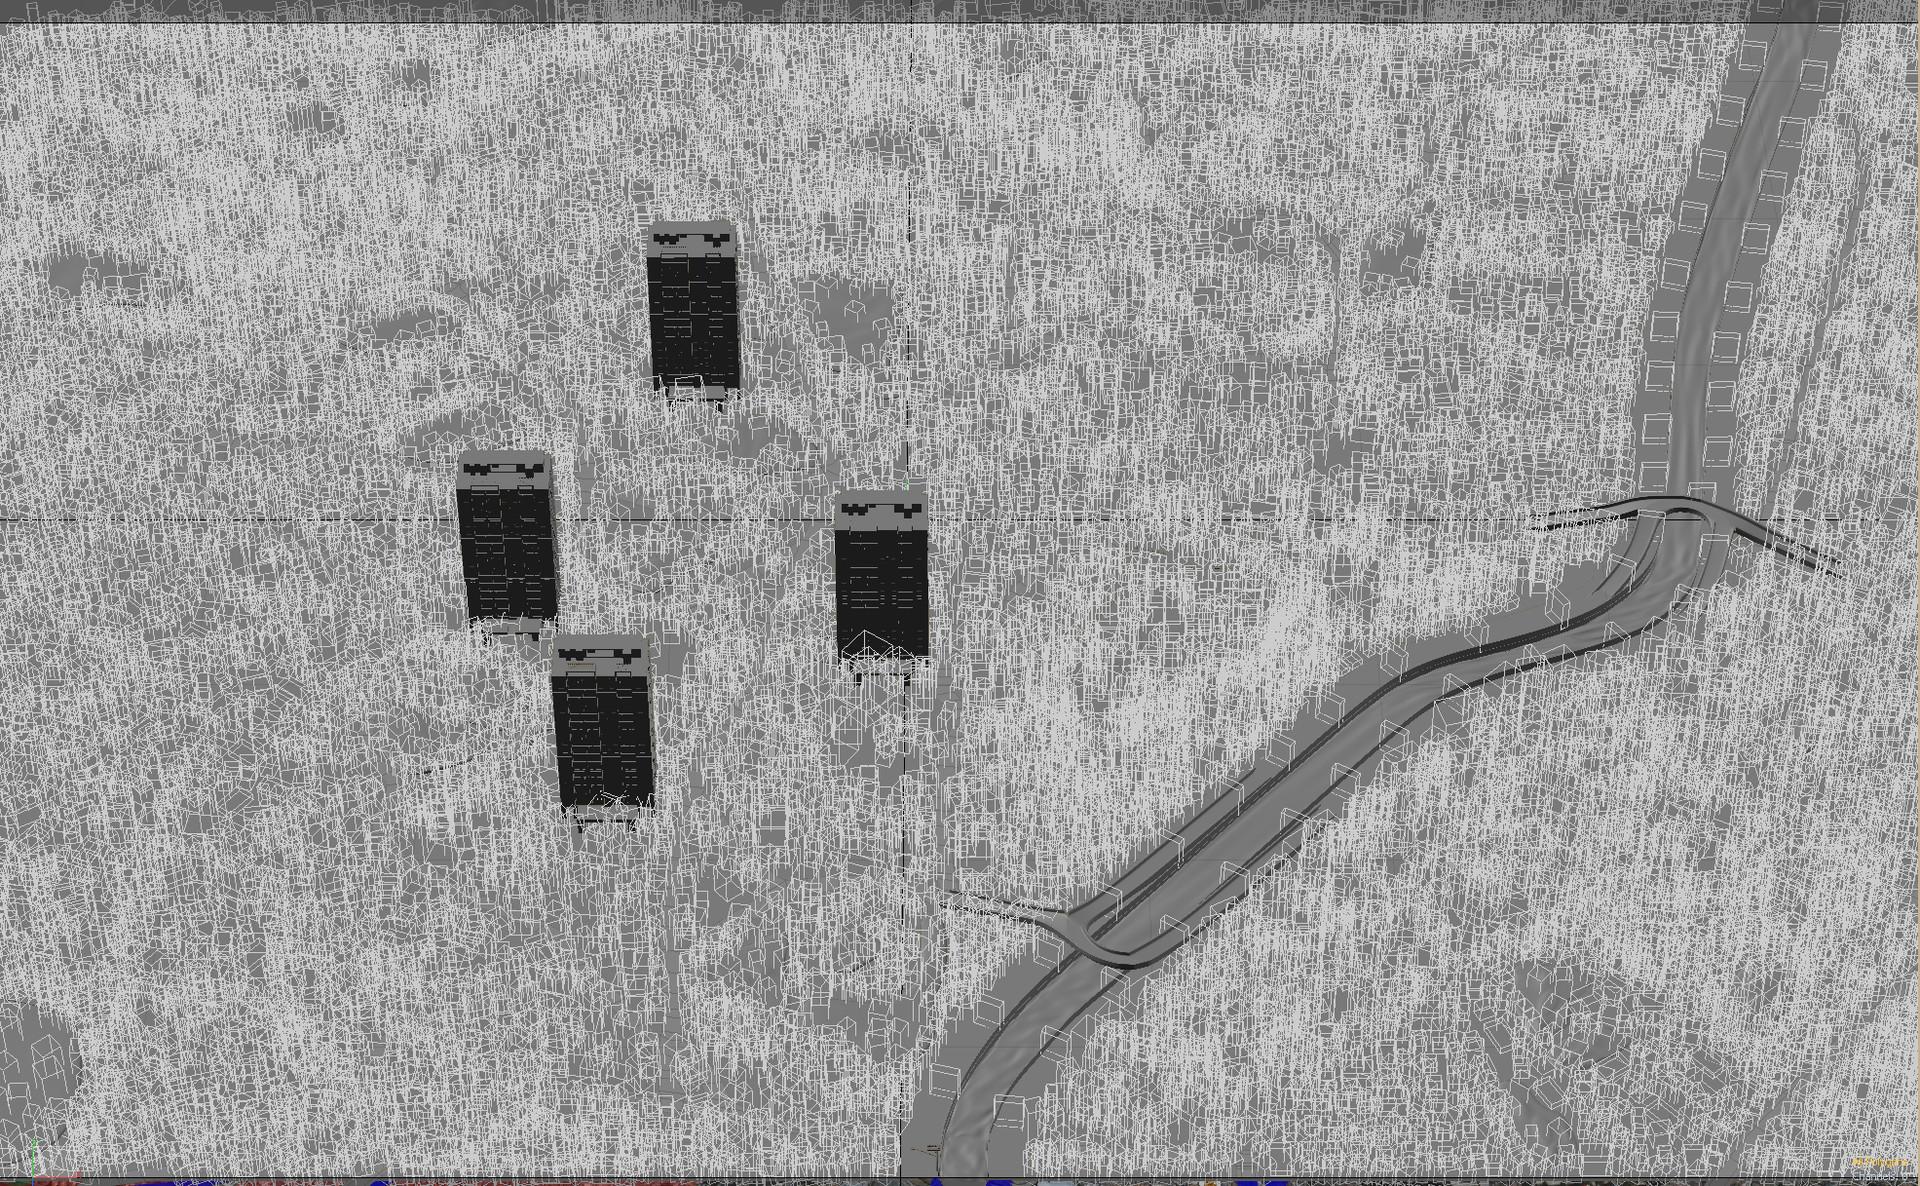 Tharso arrue mapa novo final v4 modo viewport